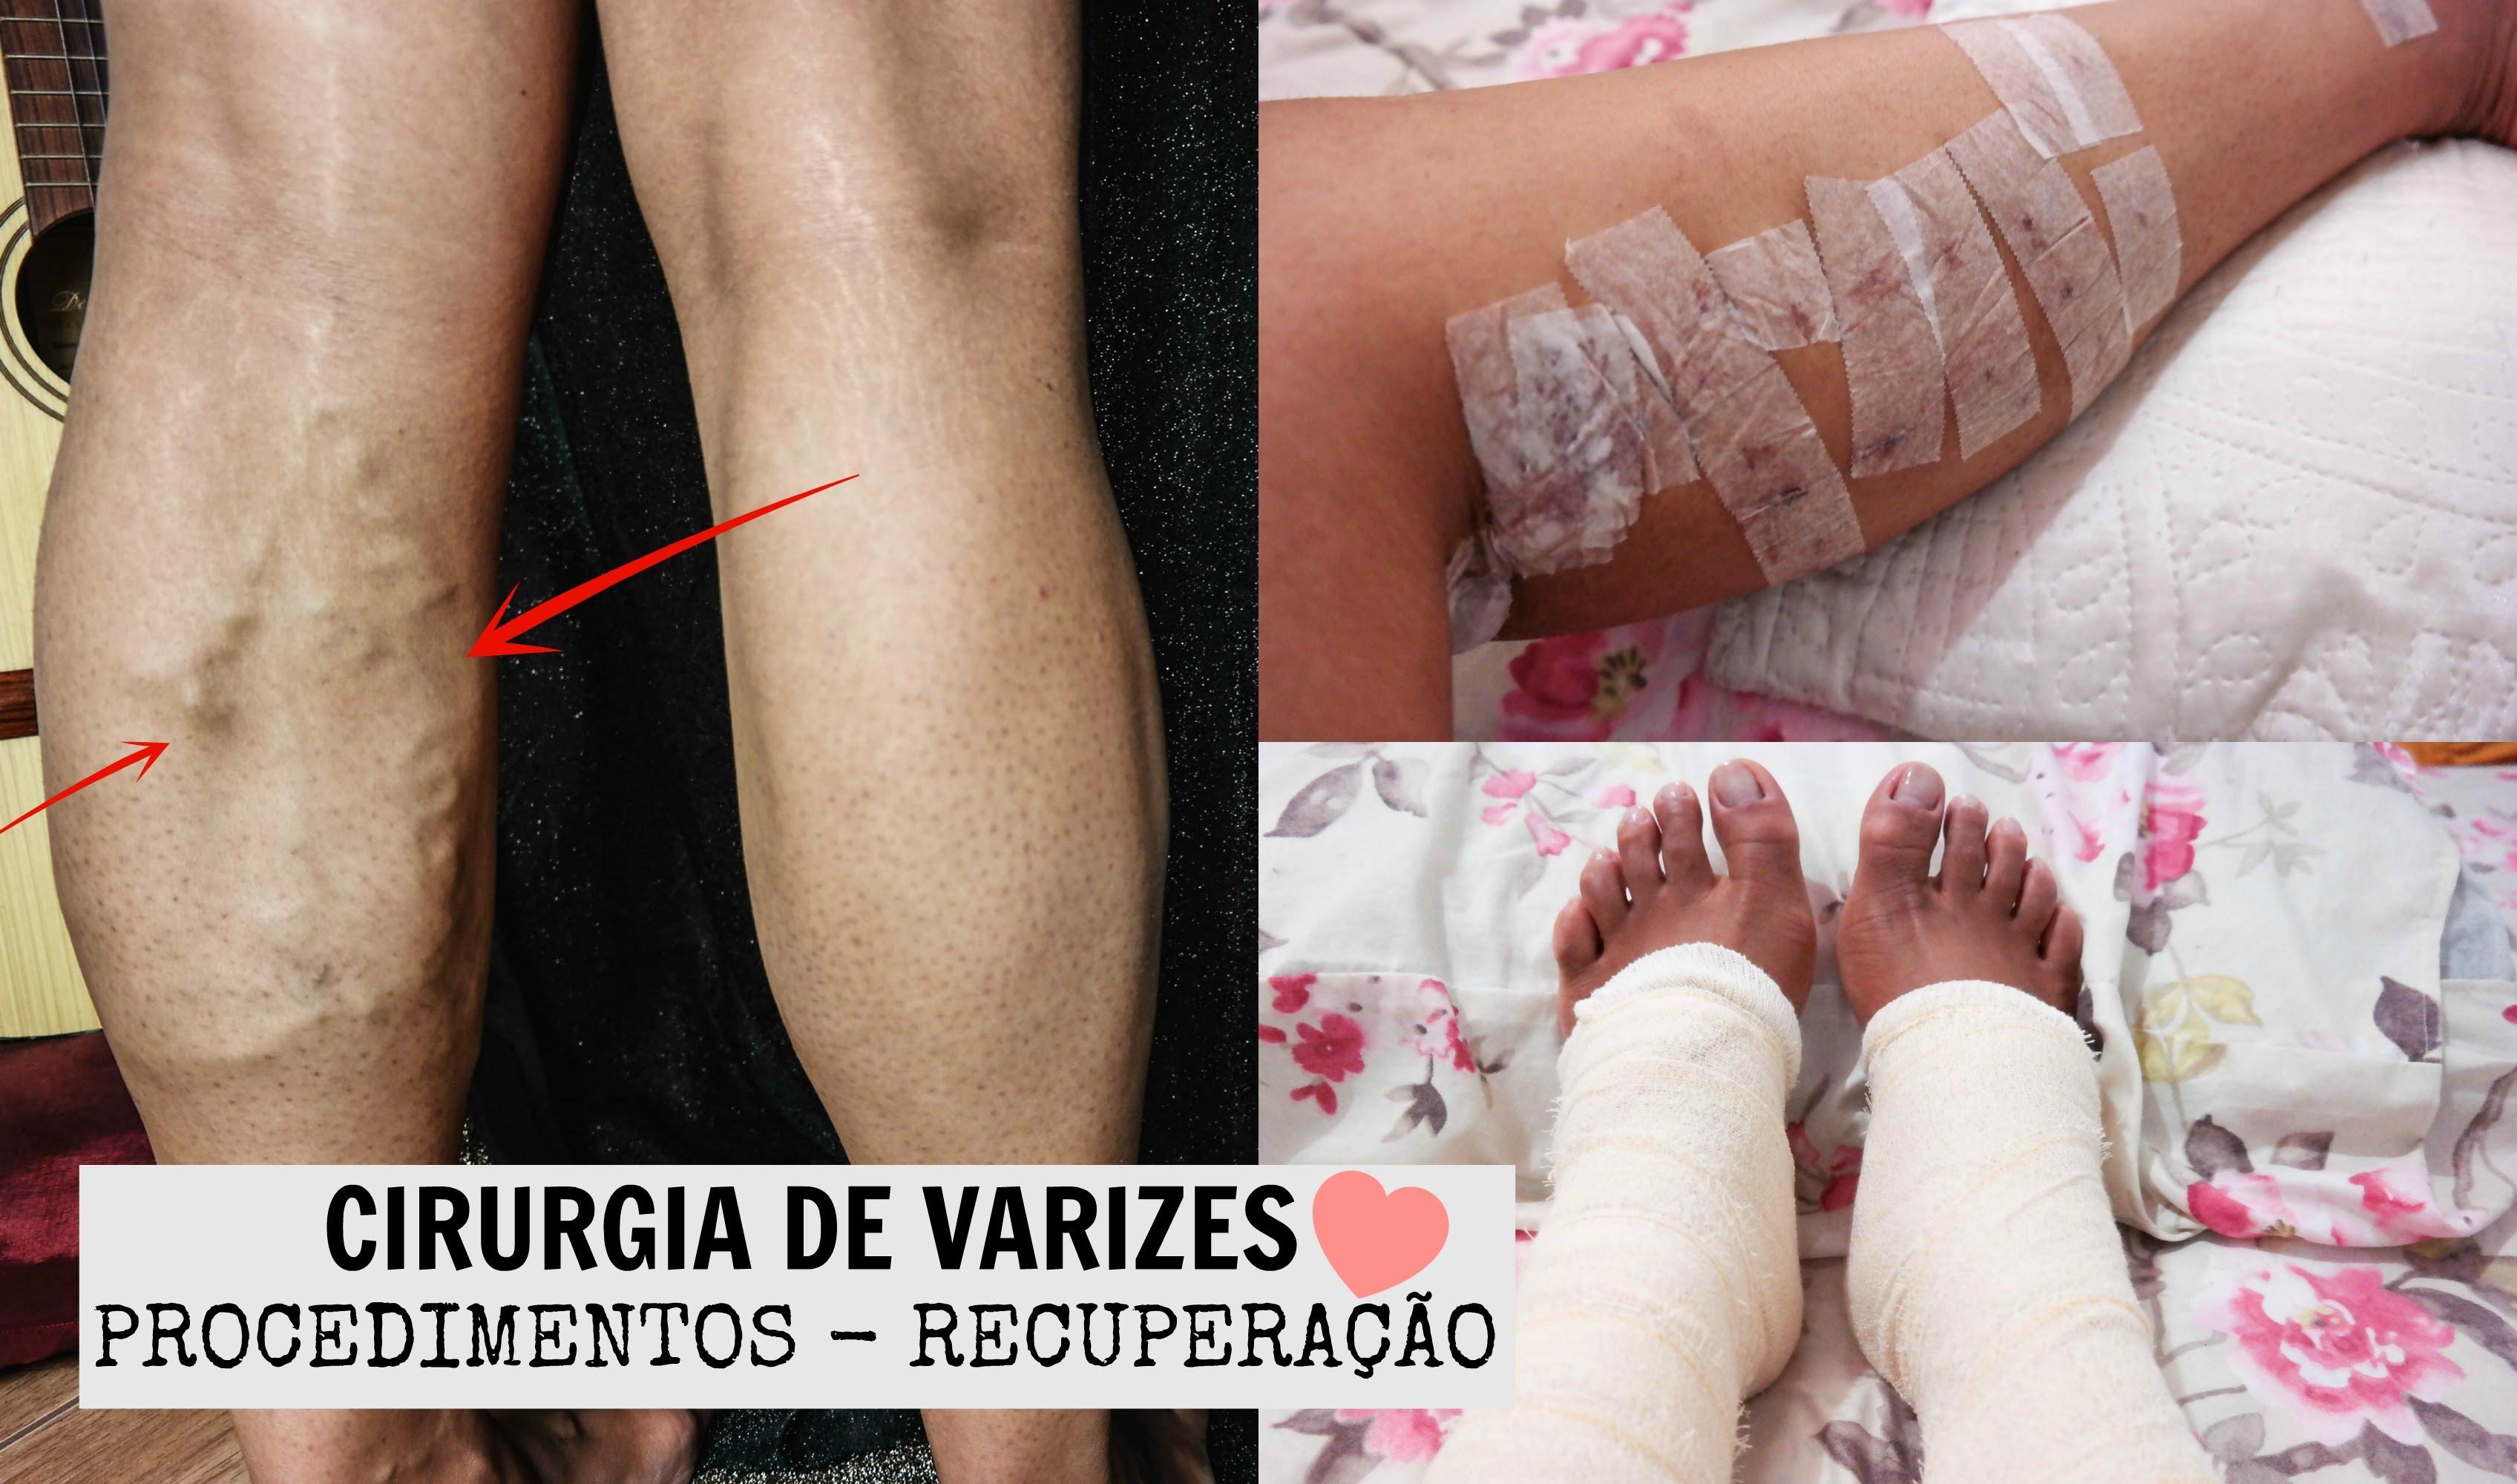 Antes e depois da cirurgia de varizes